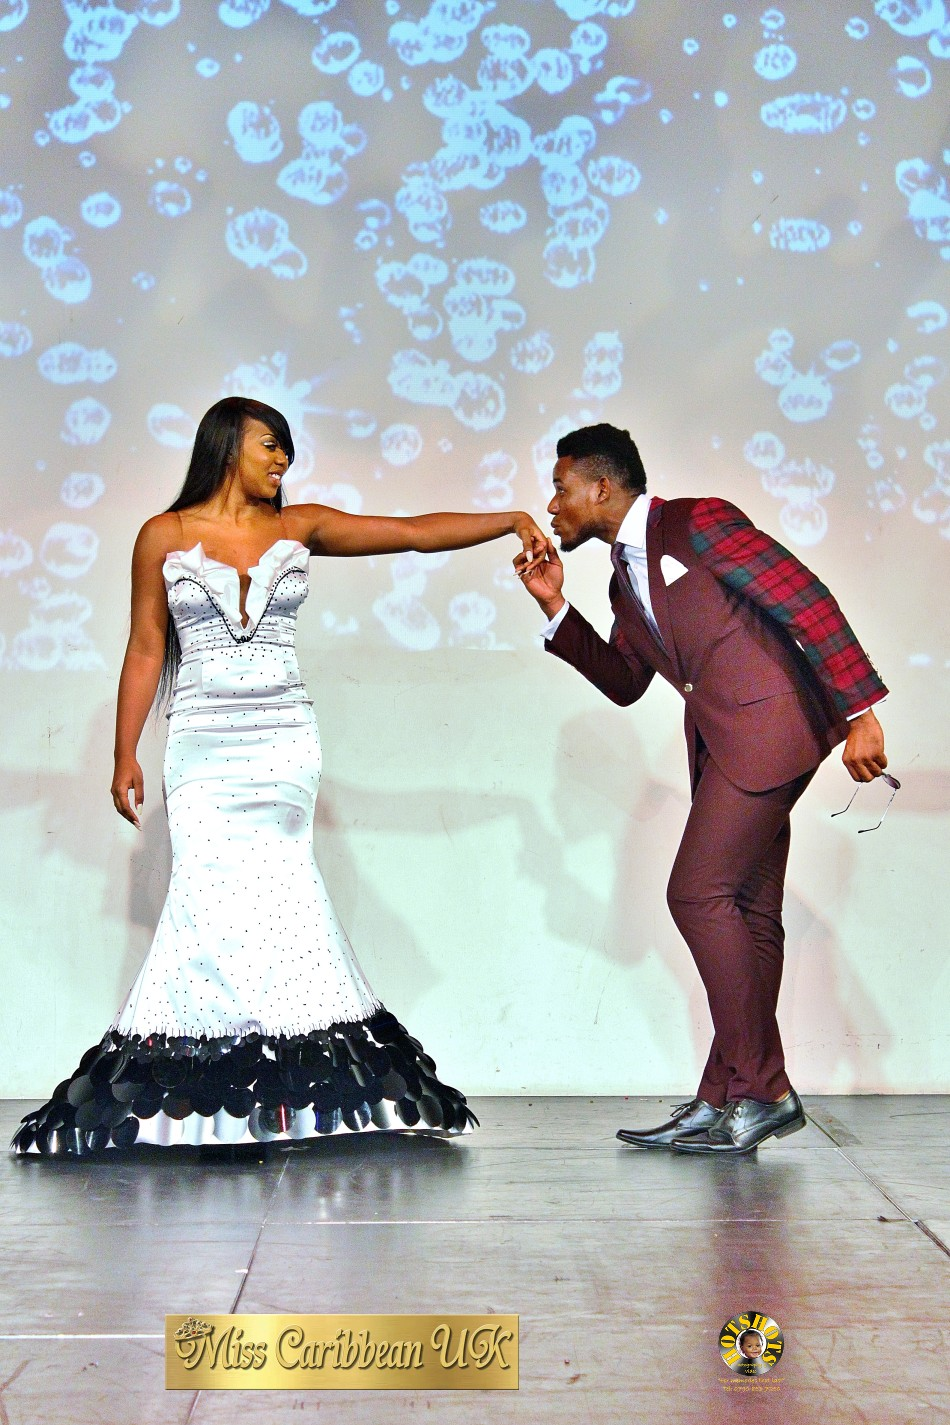 Carla Mark Thompson & Teedum Nkgee